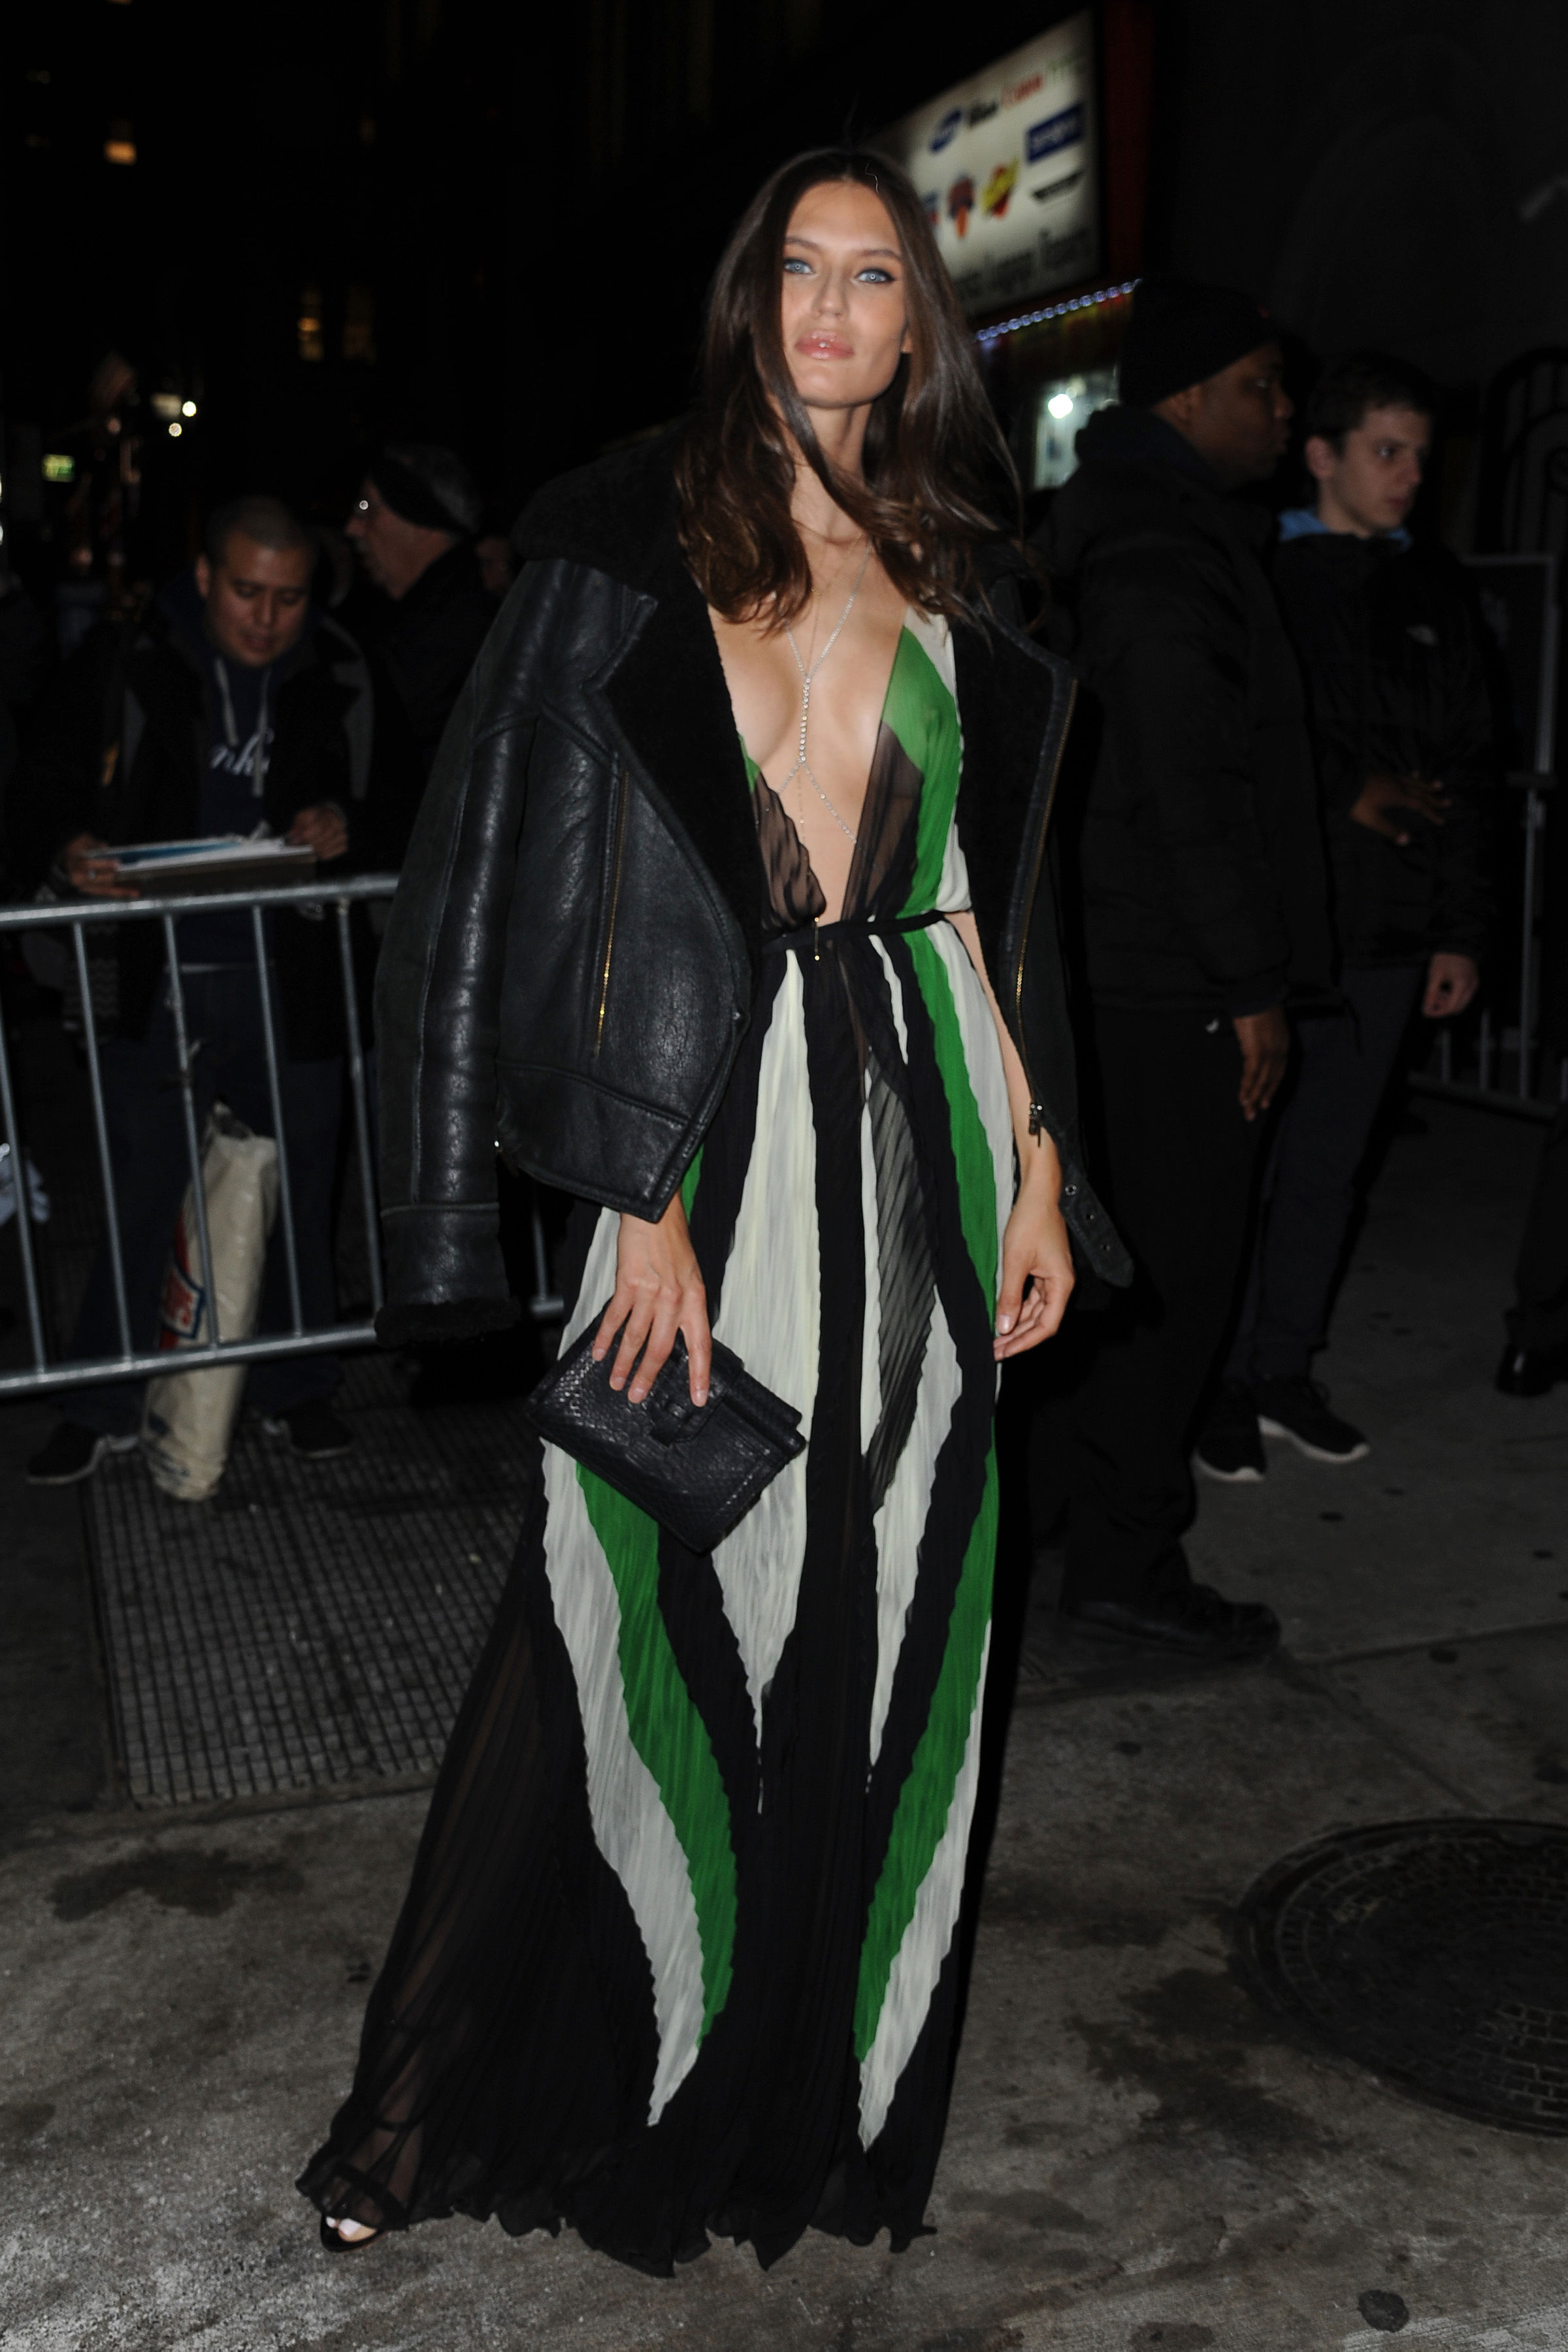 Bianca Balti Sexy & Topless - 2017 Sports Illustrated